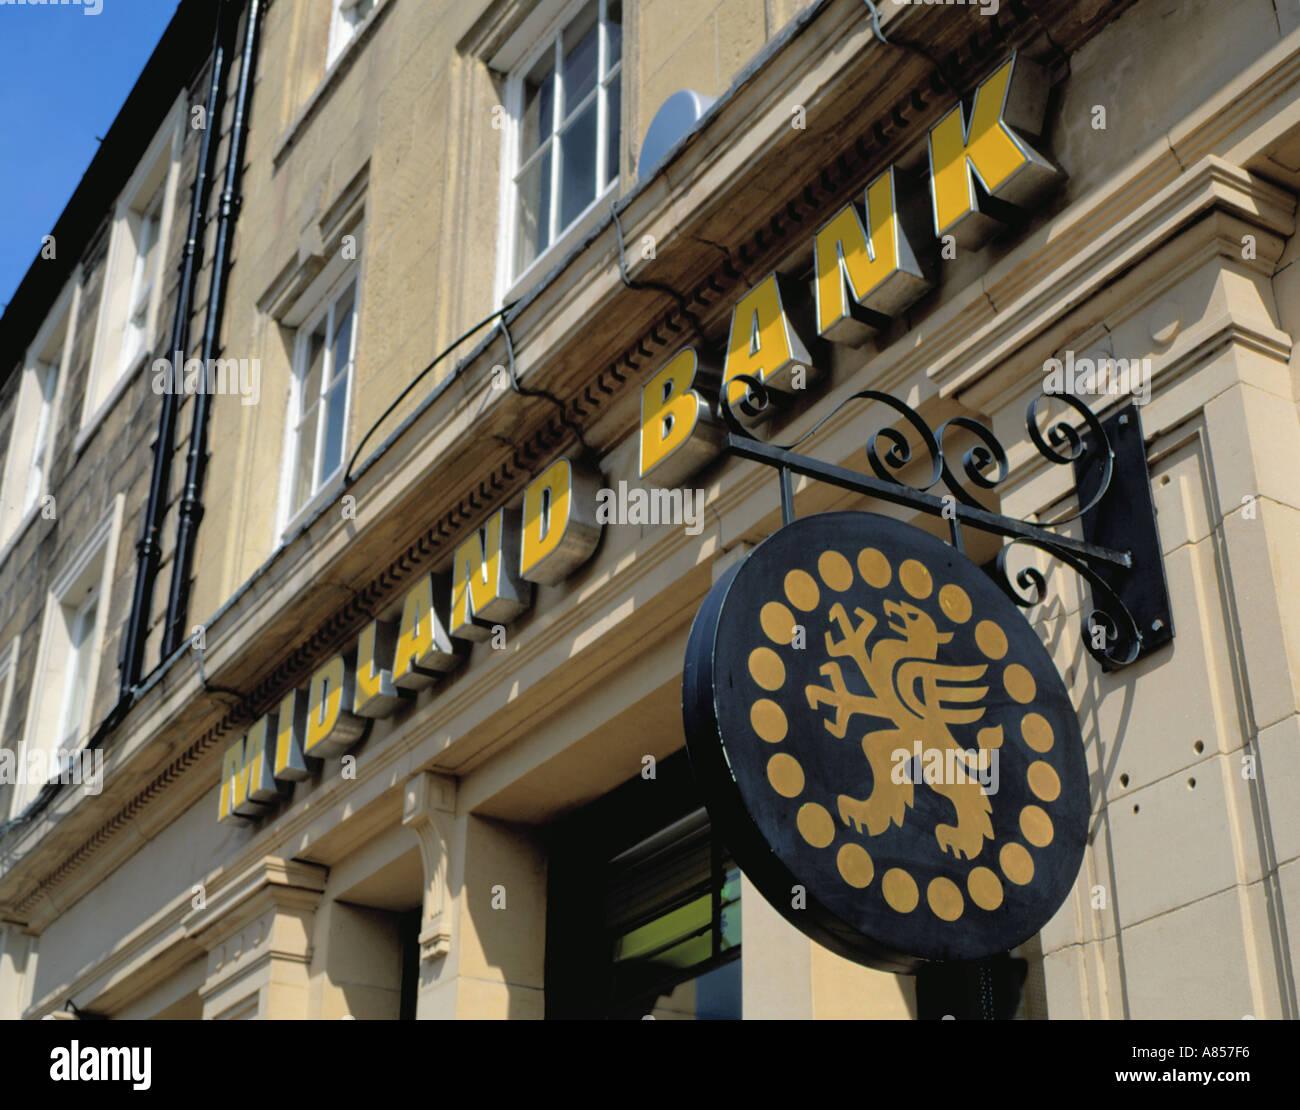 Midland Bank sign / logo / trademark outside a branch office, England, UK. Stock Photo